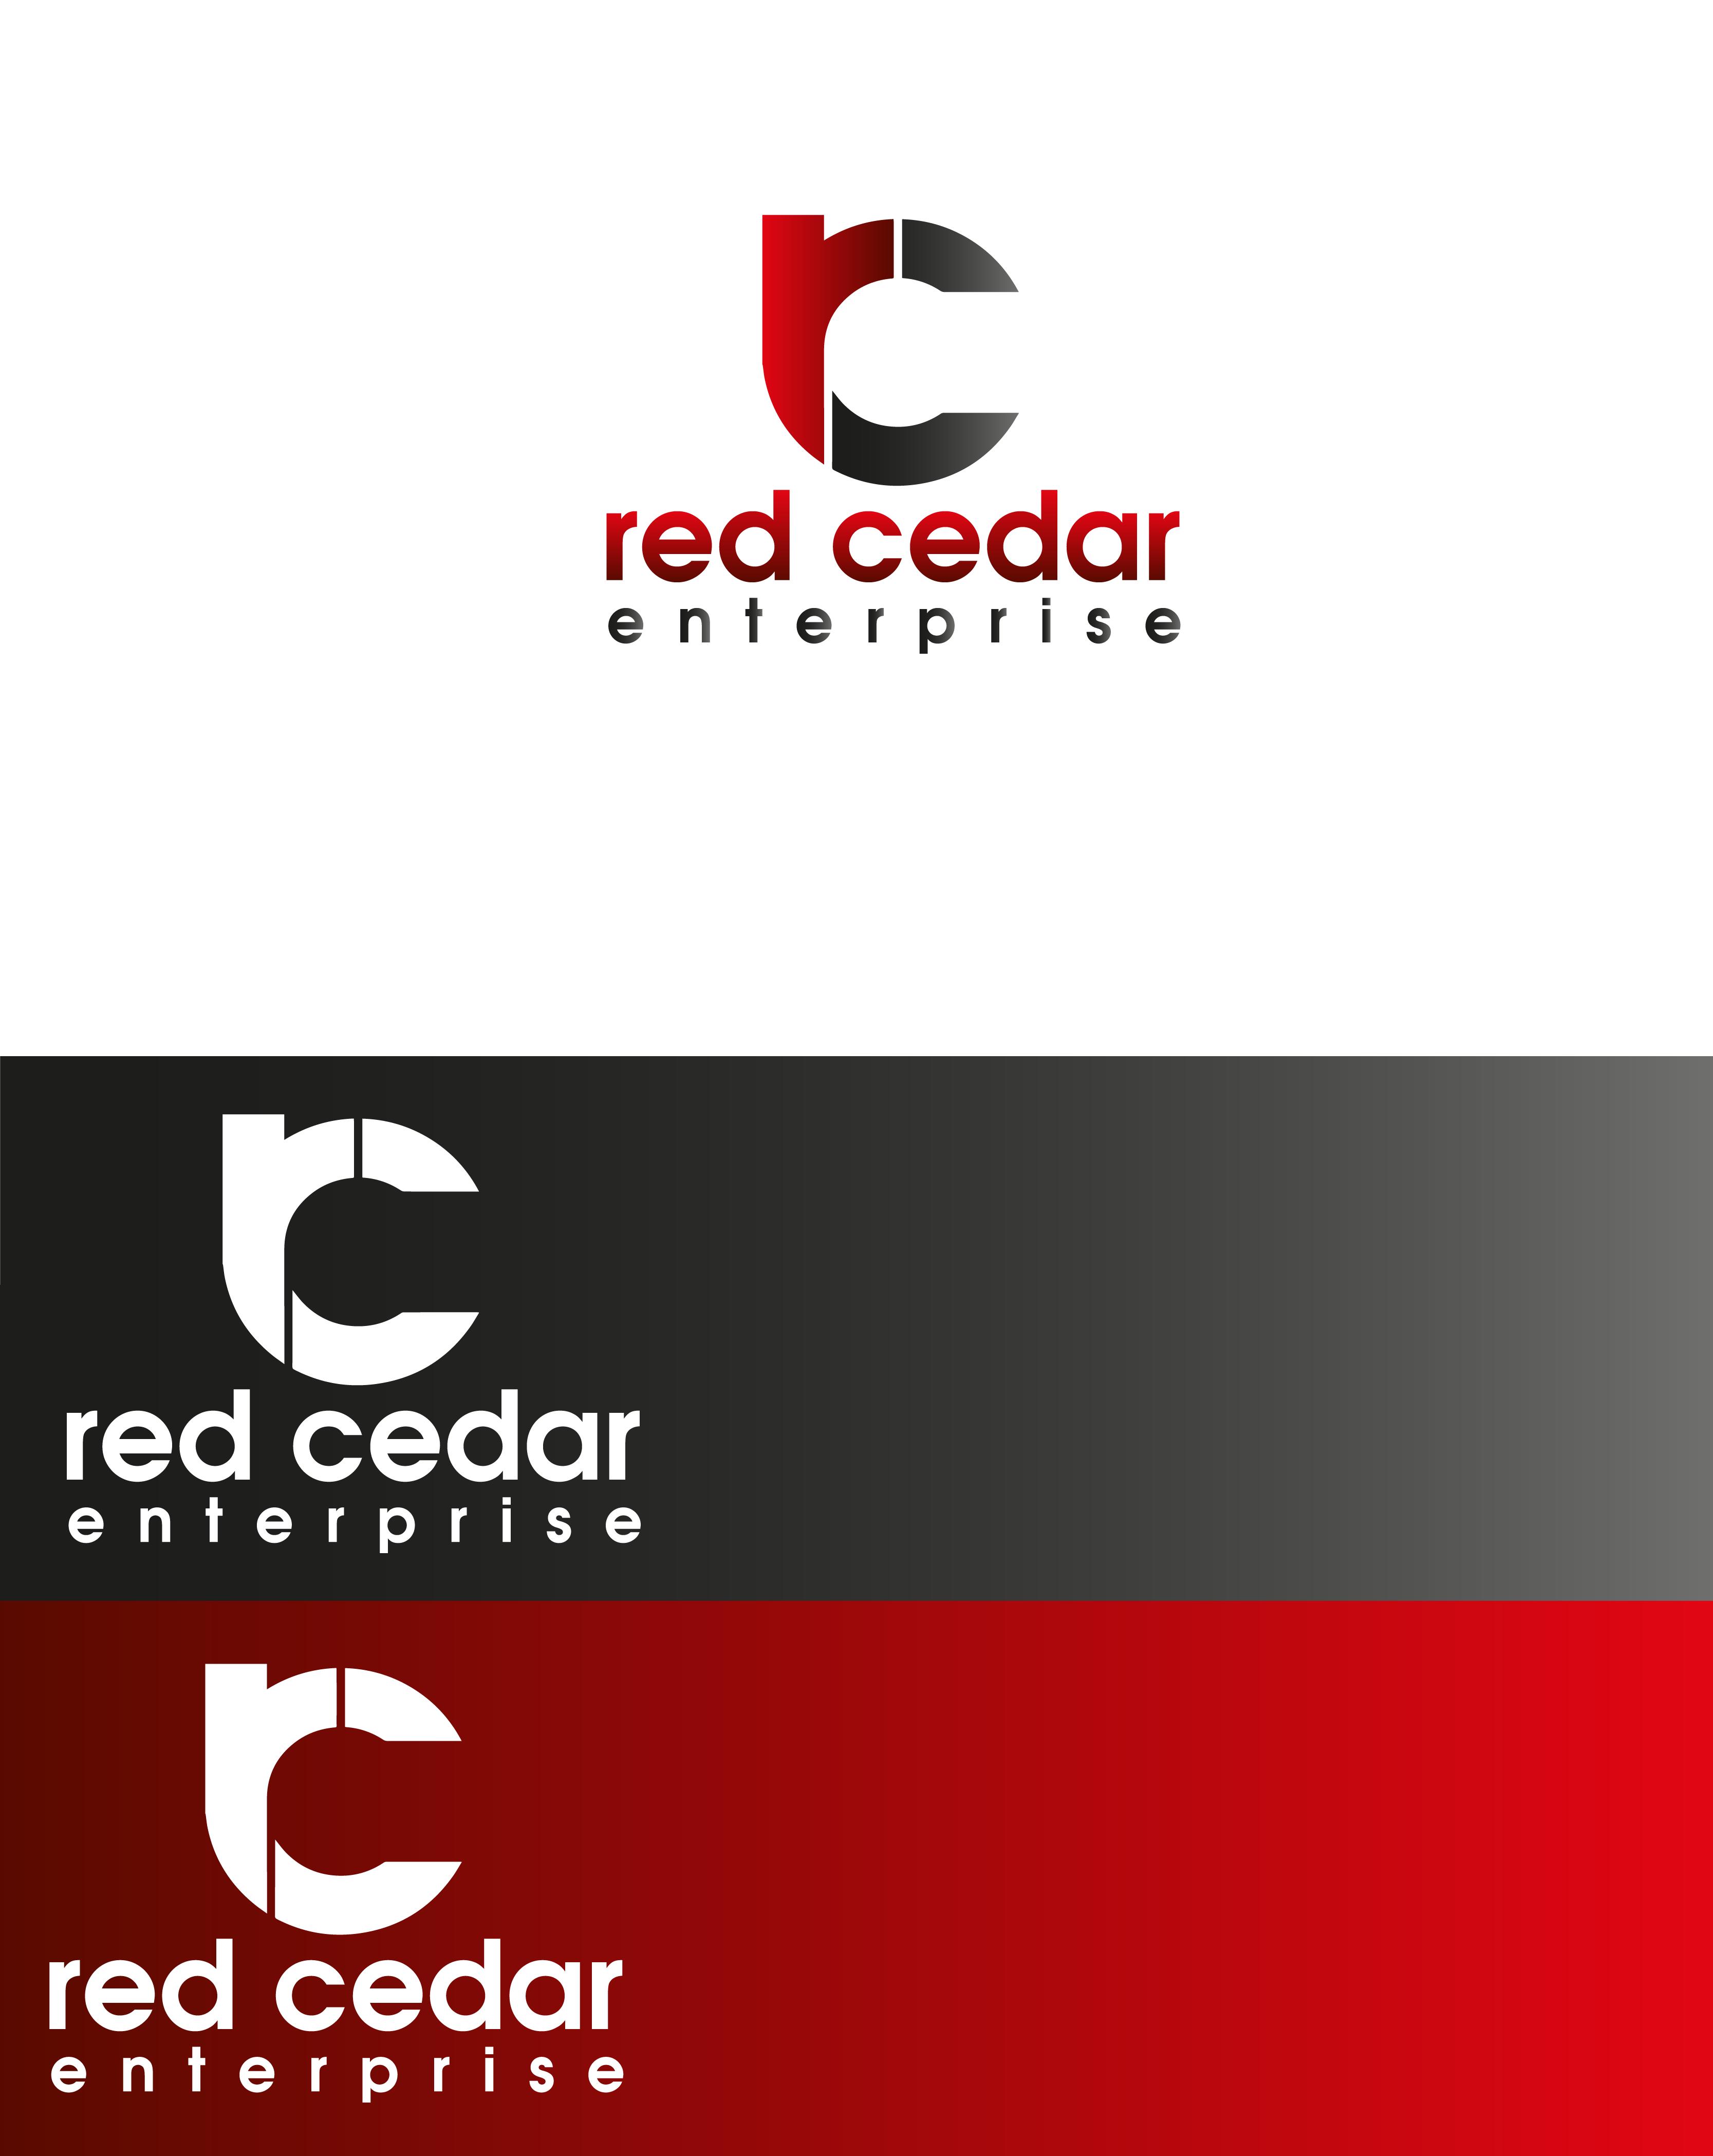 Logo Design by Private User - Entry No. 54 in the Logo Design Contest Unique Logo Design Wanted for Red Cedar Enterprise.